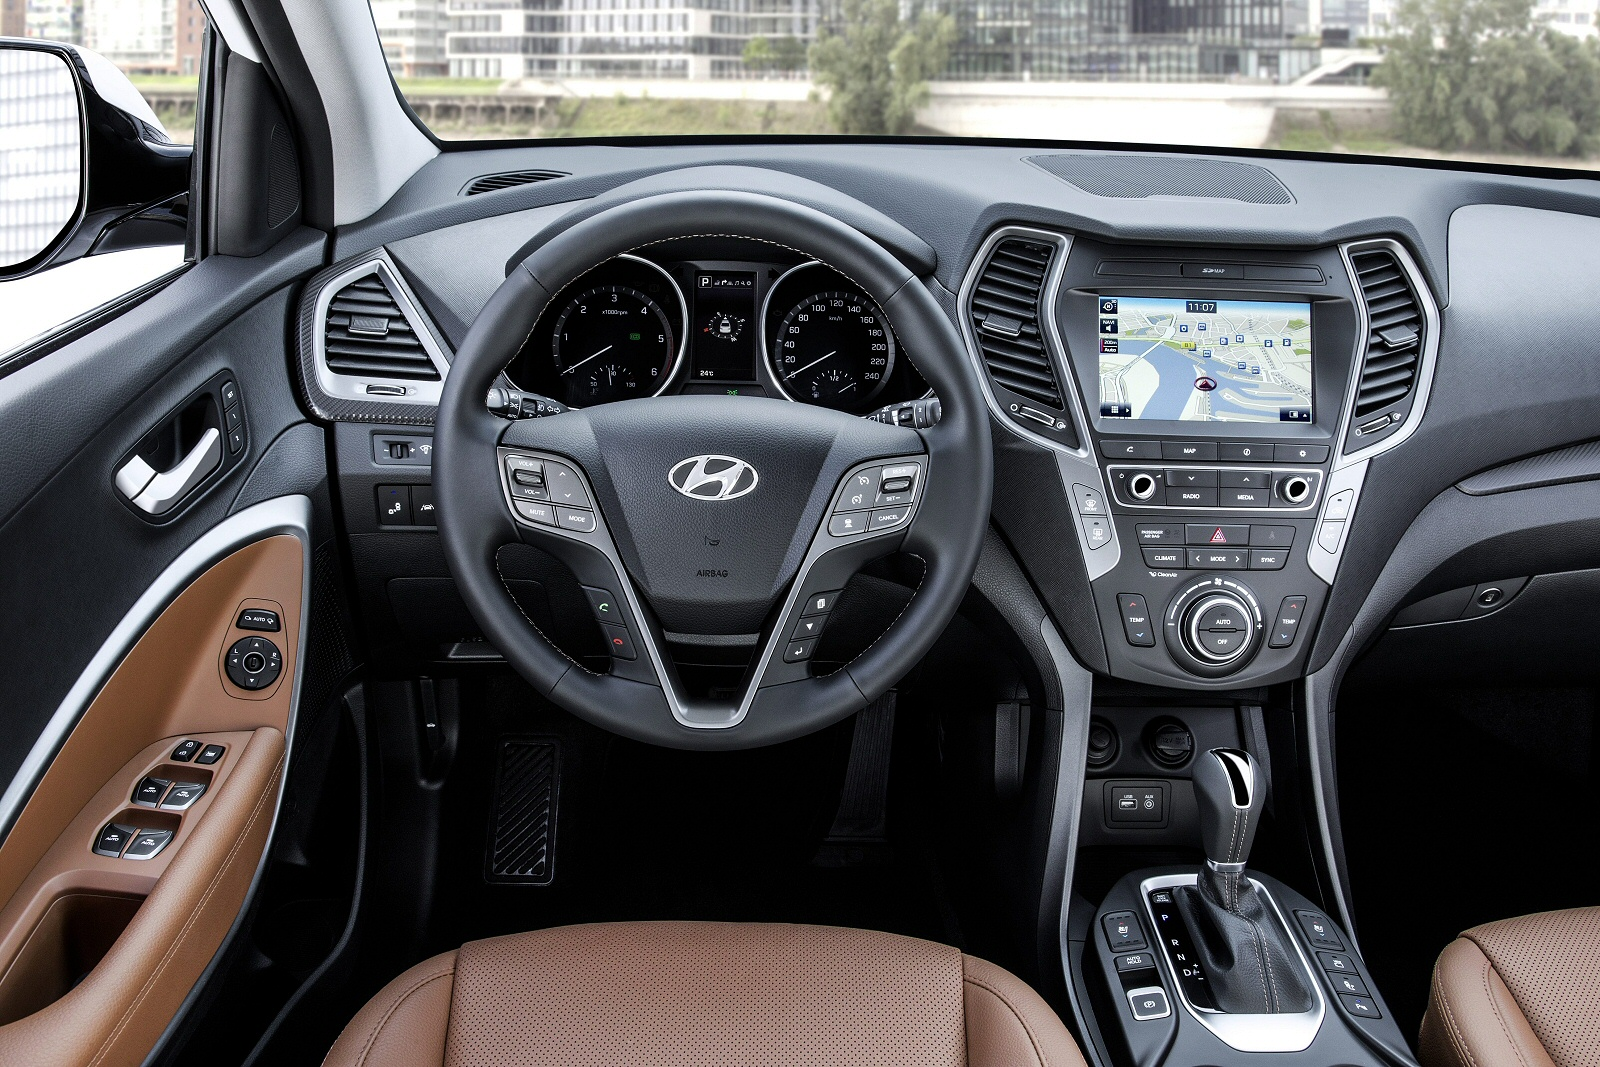 New Hyundai Santa Fe 2 2 Crdi Blue Drive Premium 5dr Auto